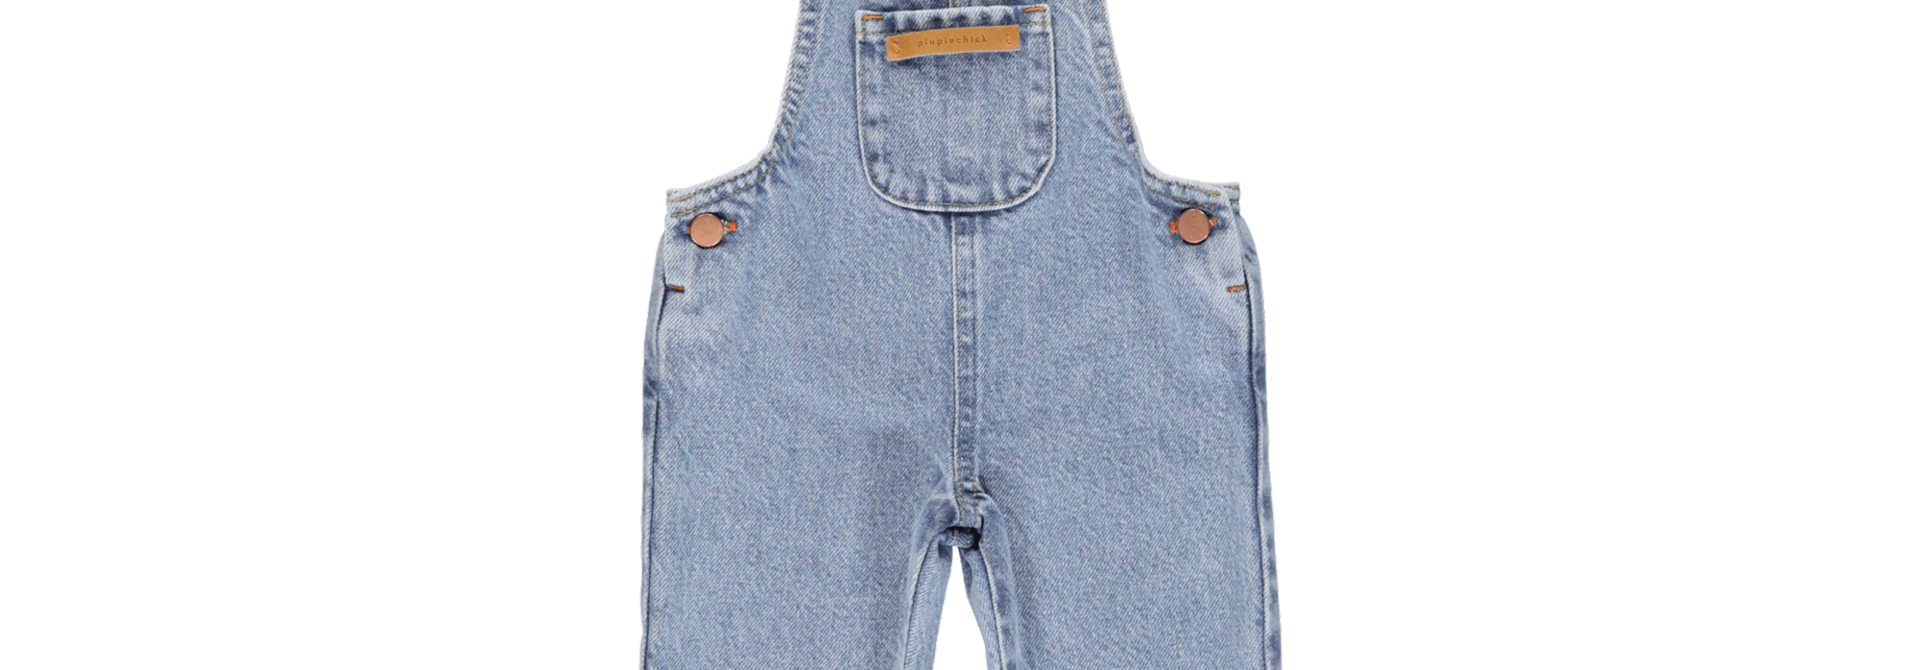 Dungarees denim jeans